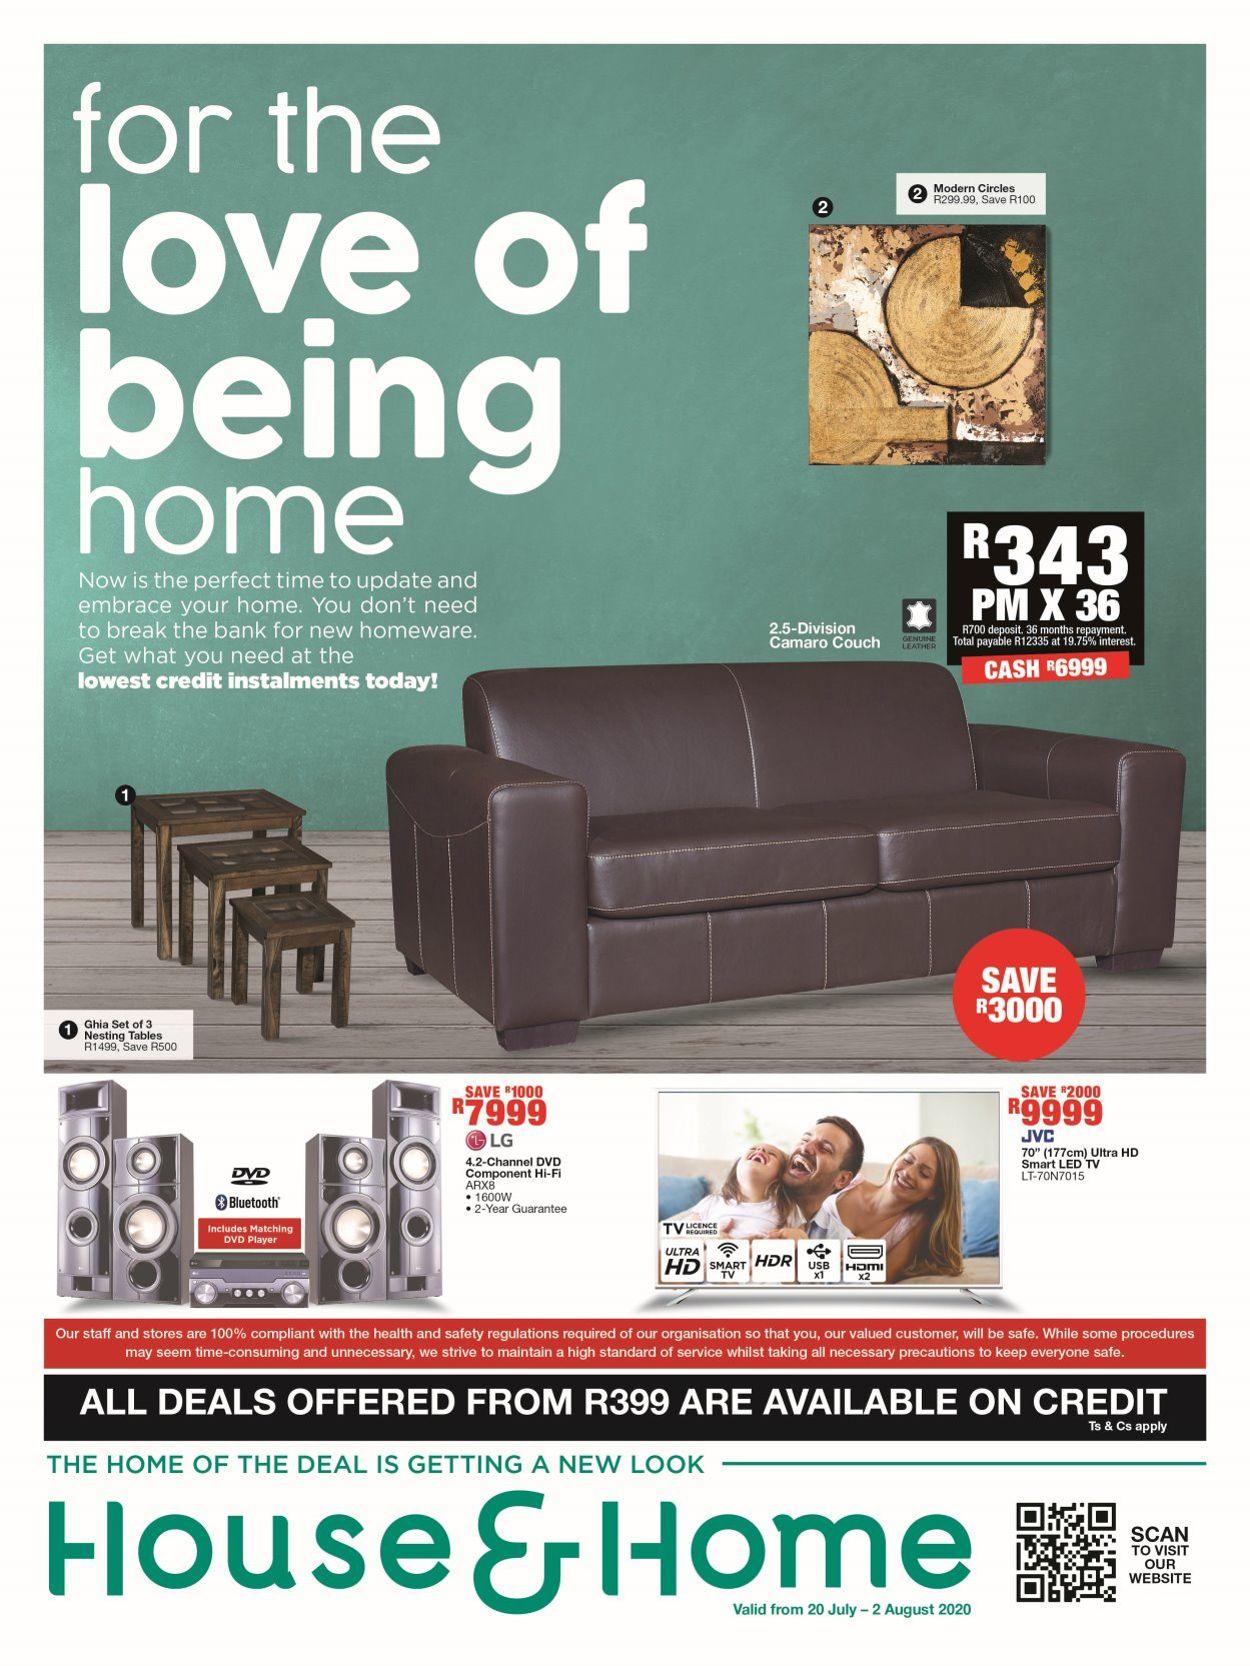 House & Home Catalogue - 2020/07/20-2020/08/02